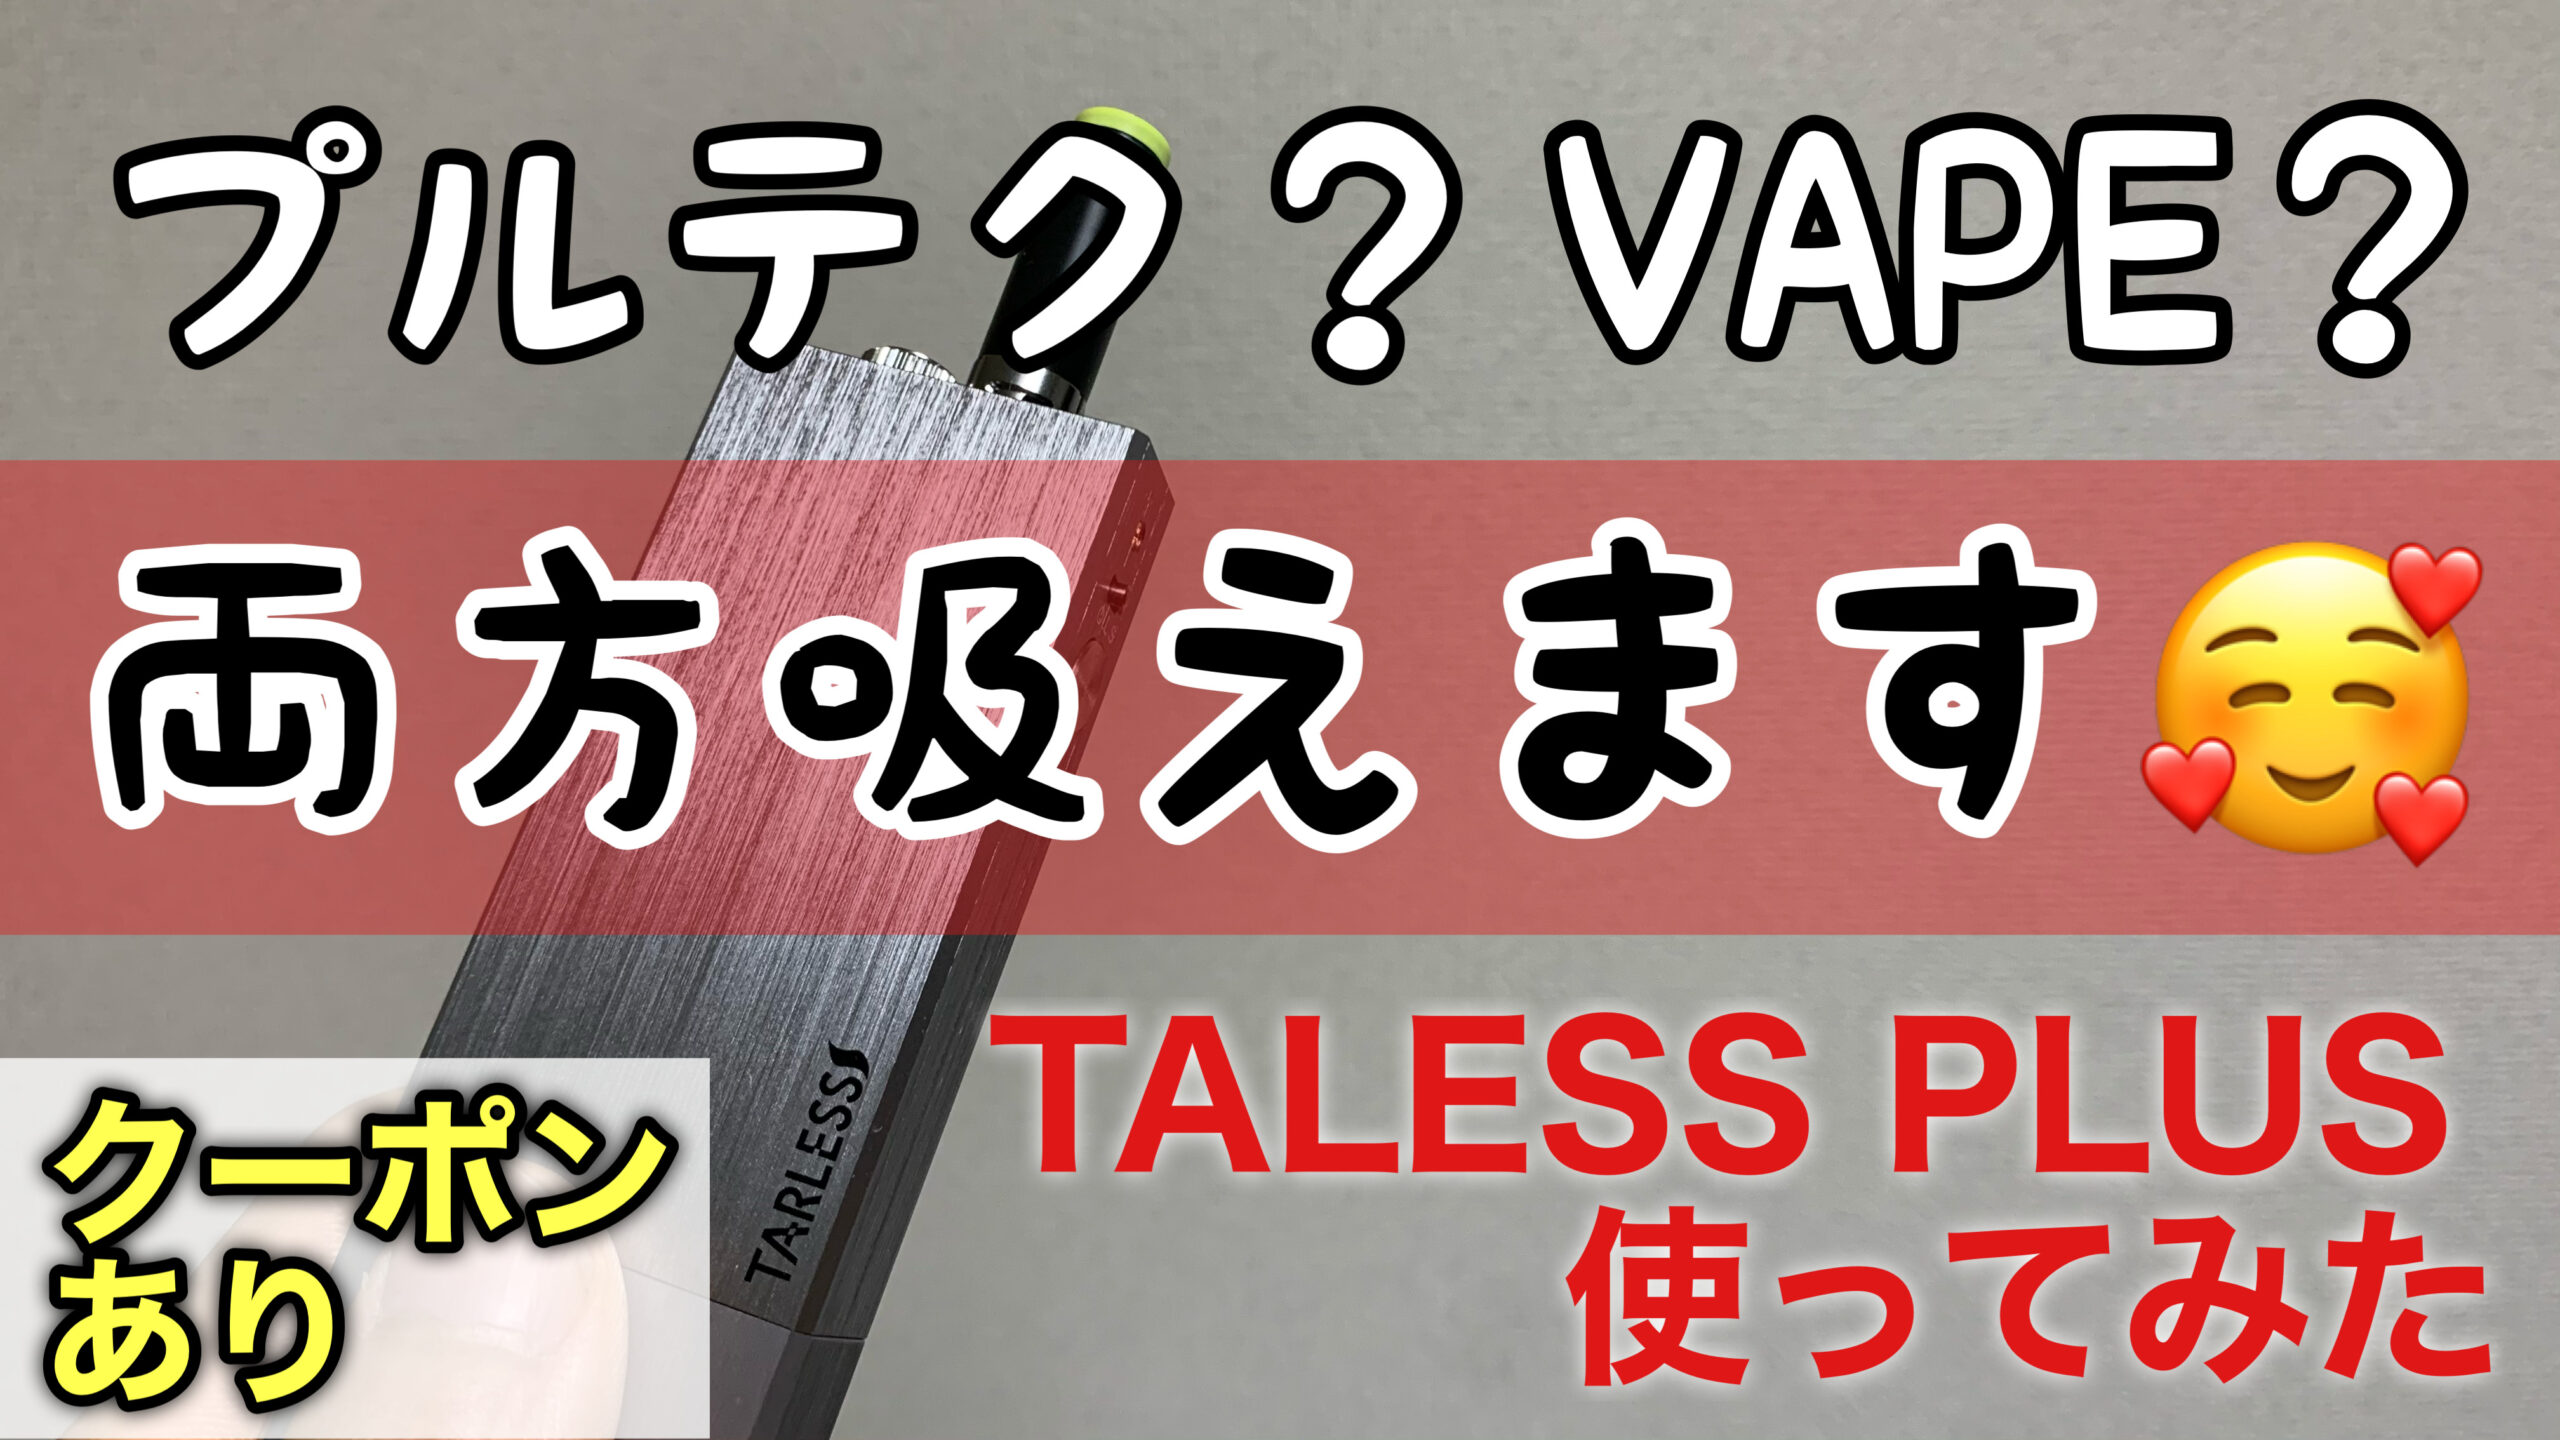 tarless review eyecatch